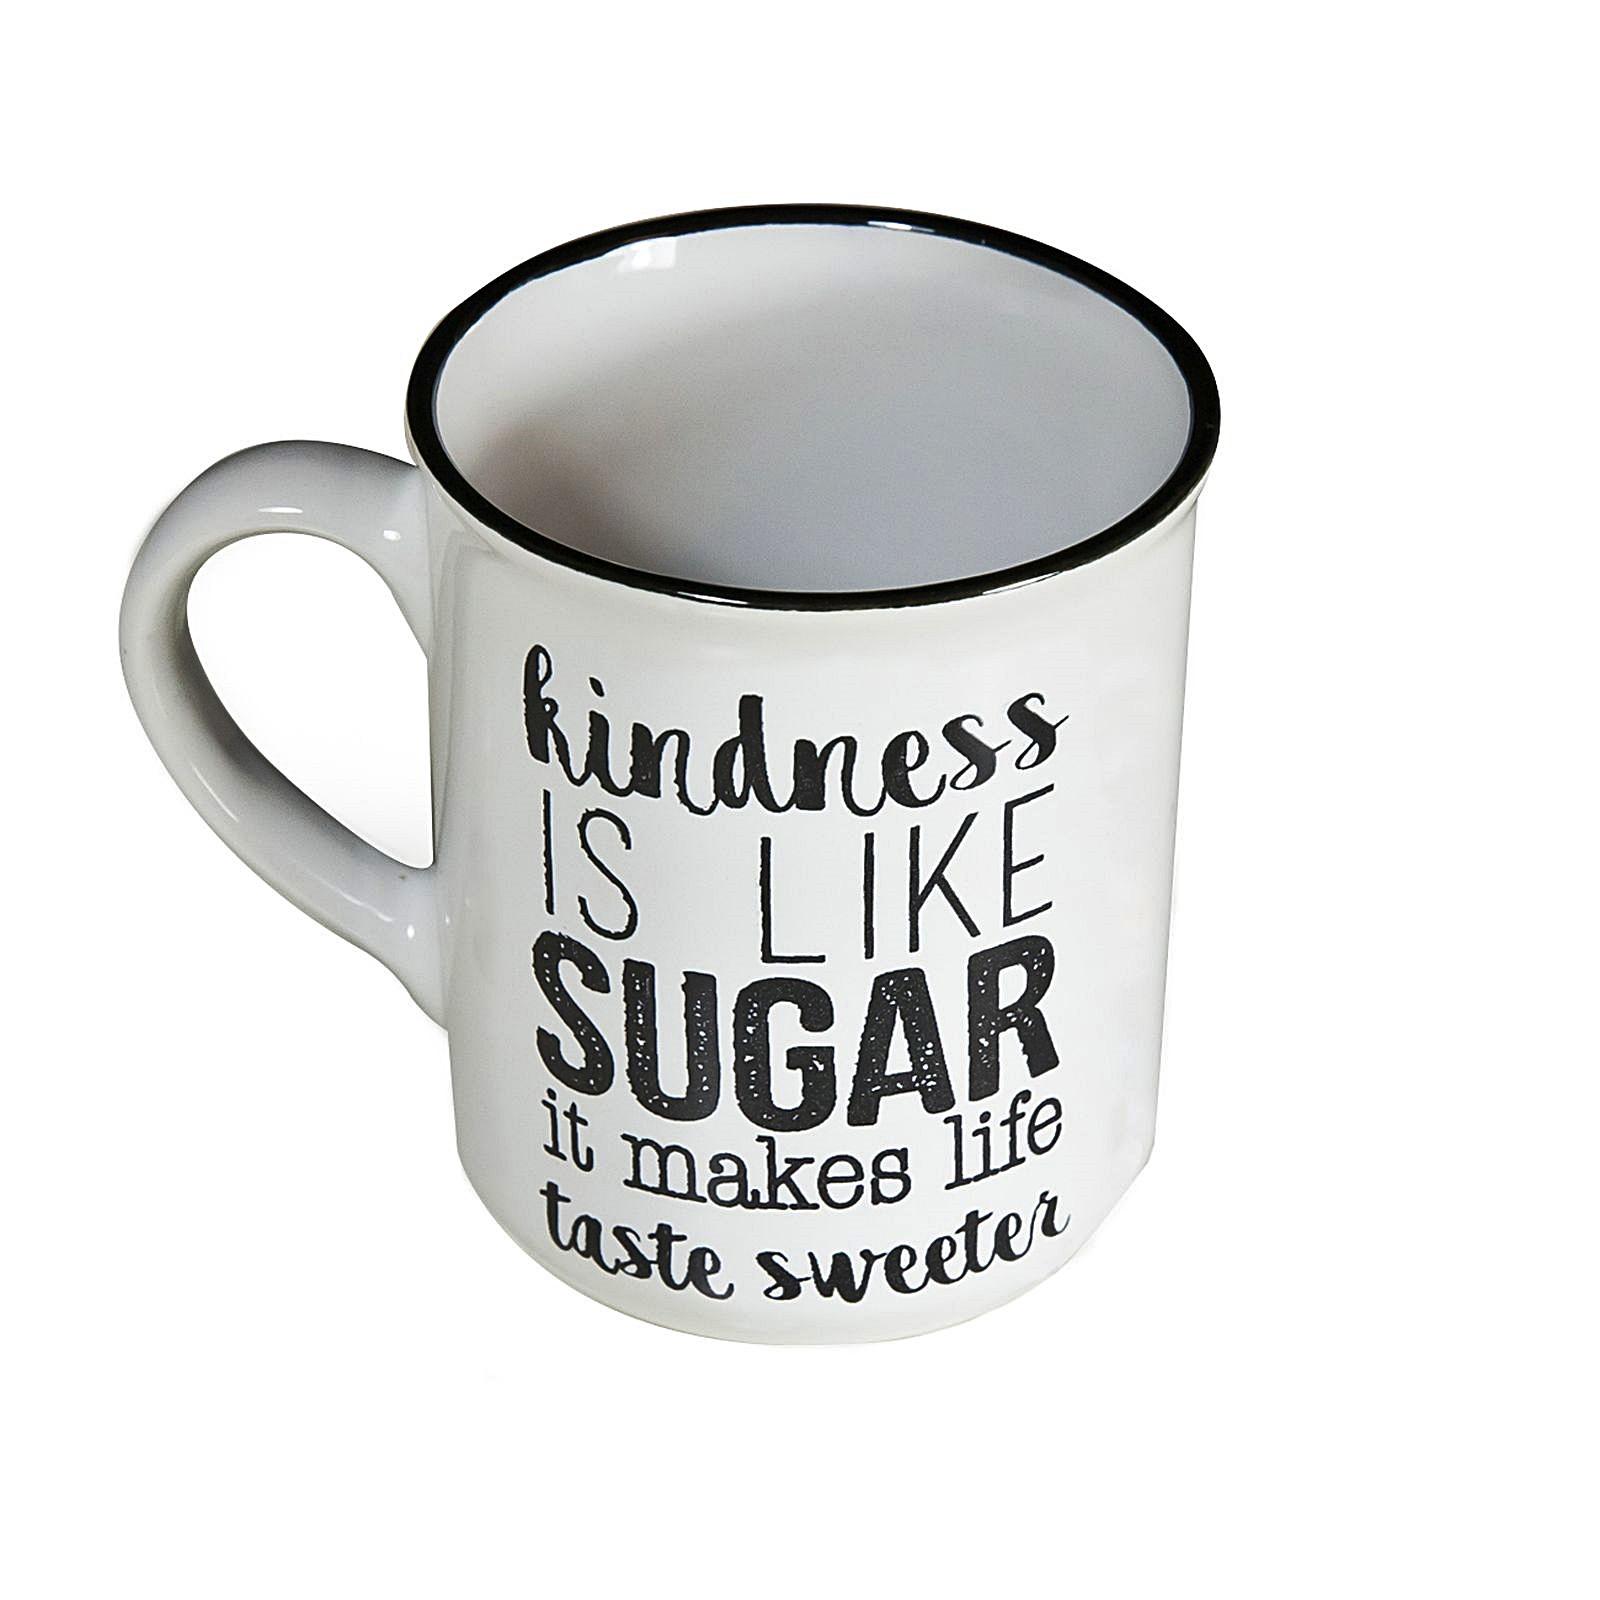 6er set tasse tassen 300 ml kaffeetasse gro e becher keramik kaffee mug aufdruck ebay. Black Bedroom Furniture Sets. Home Design Ideas